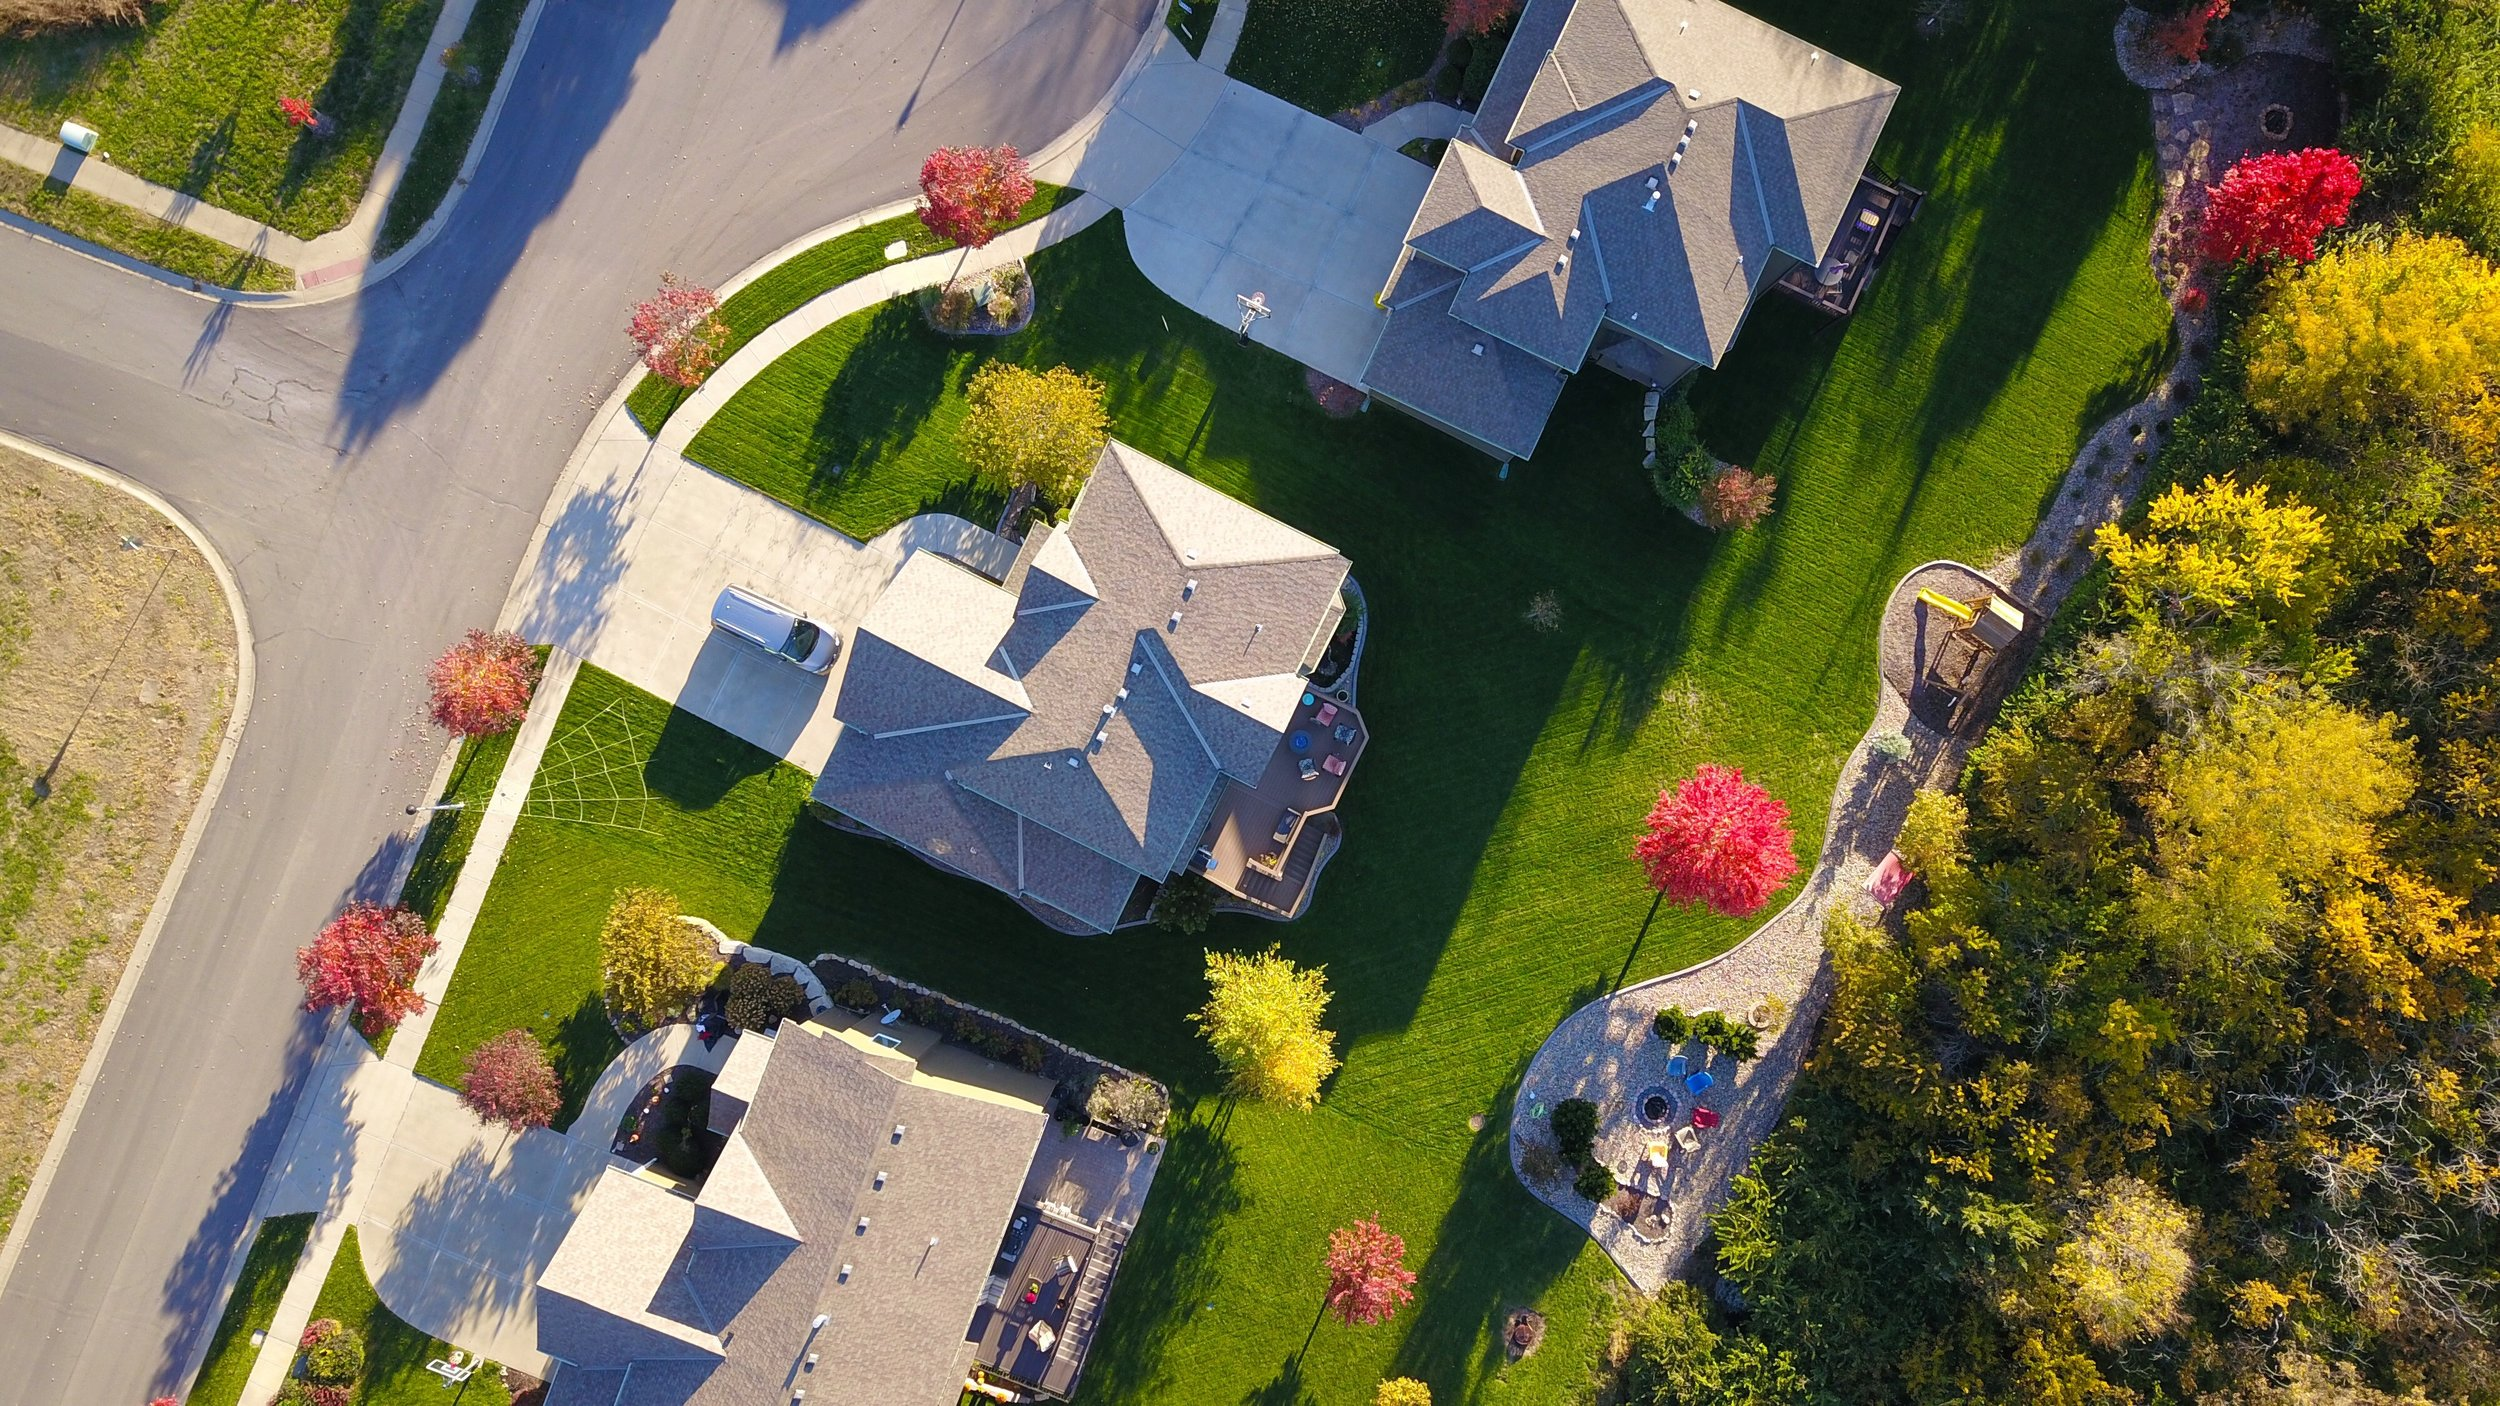 aerial-photography-aerial-shot-aerial-view-1546166.jpg